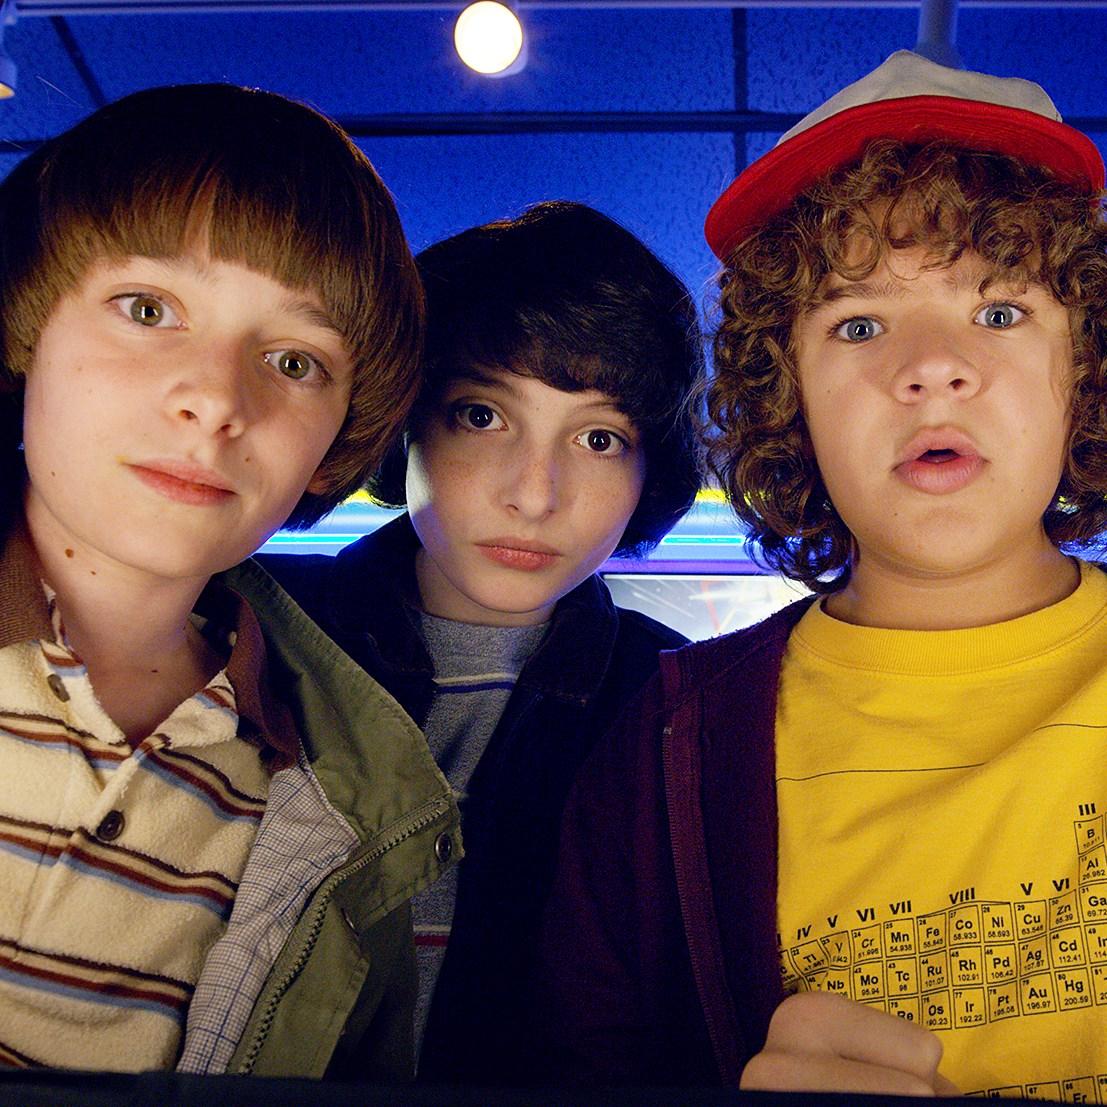 Noah Schnapp, Finn Wolfhard, Gaten Matarazzo and Caleb Mclaughlin in 'Stranger Things' Season 2